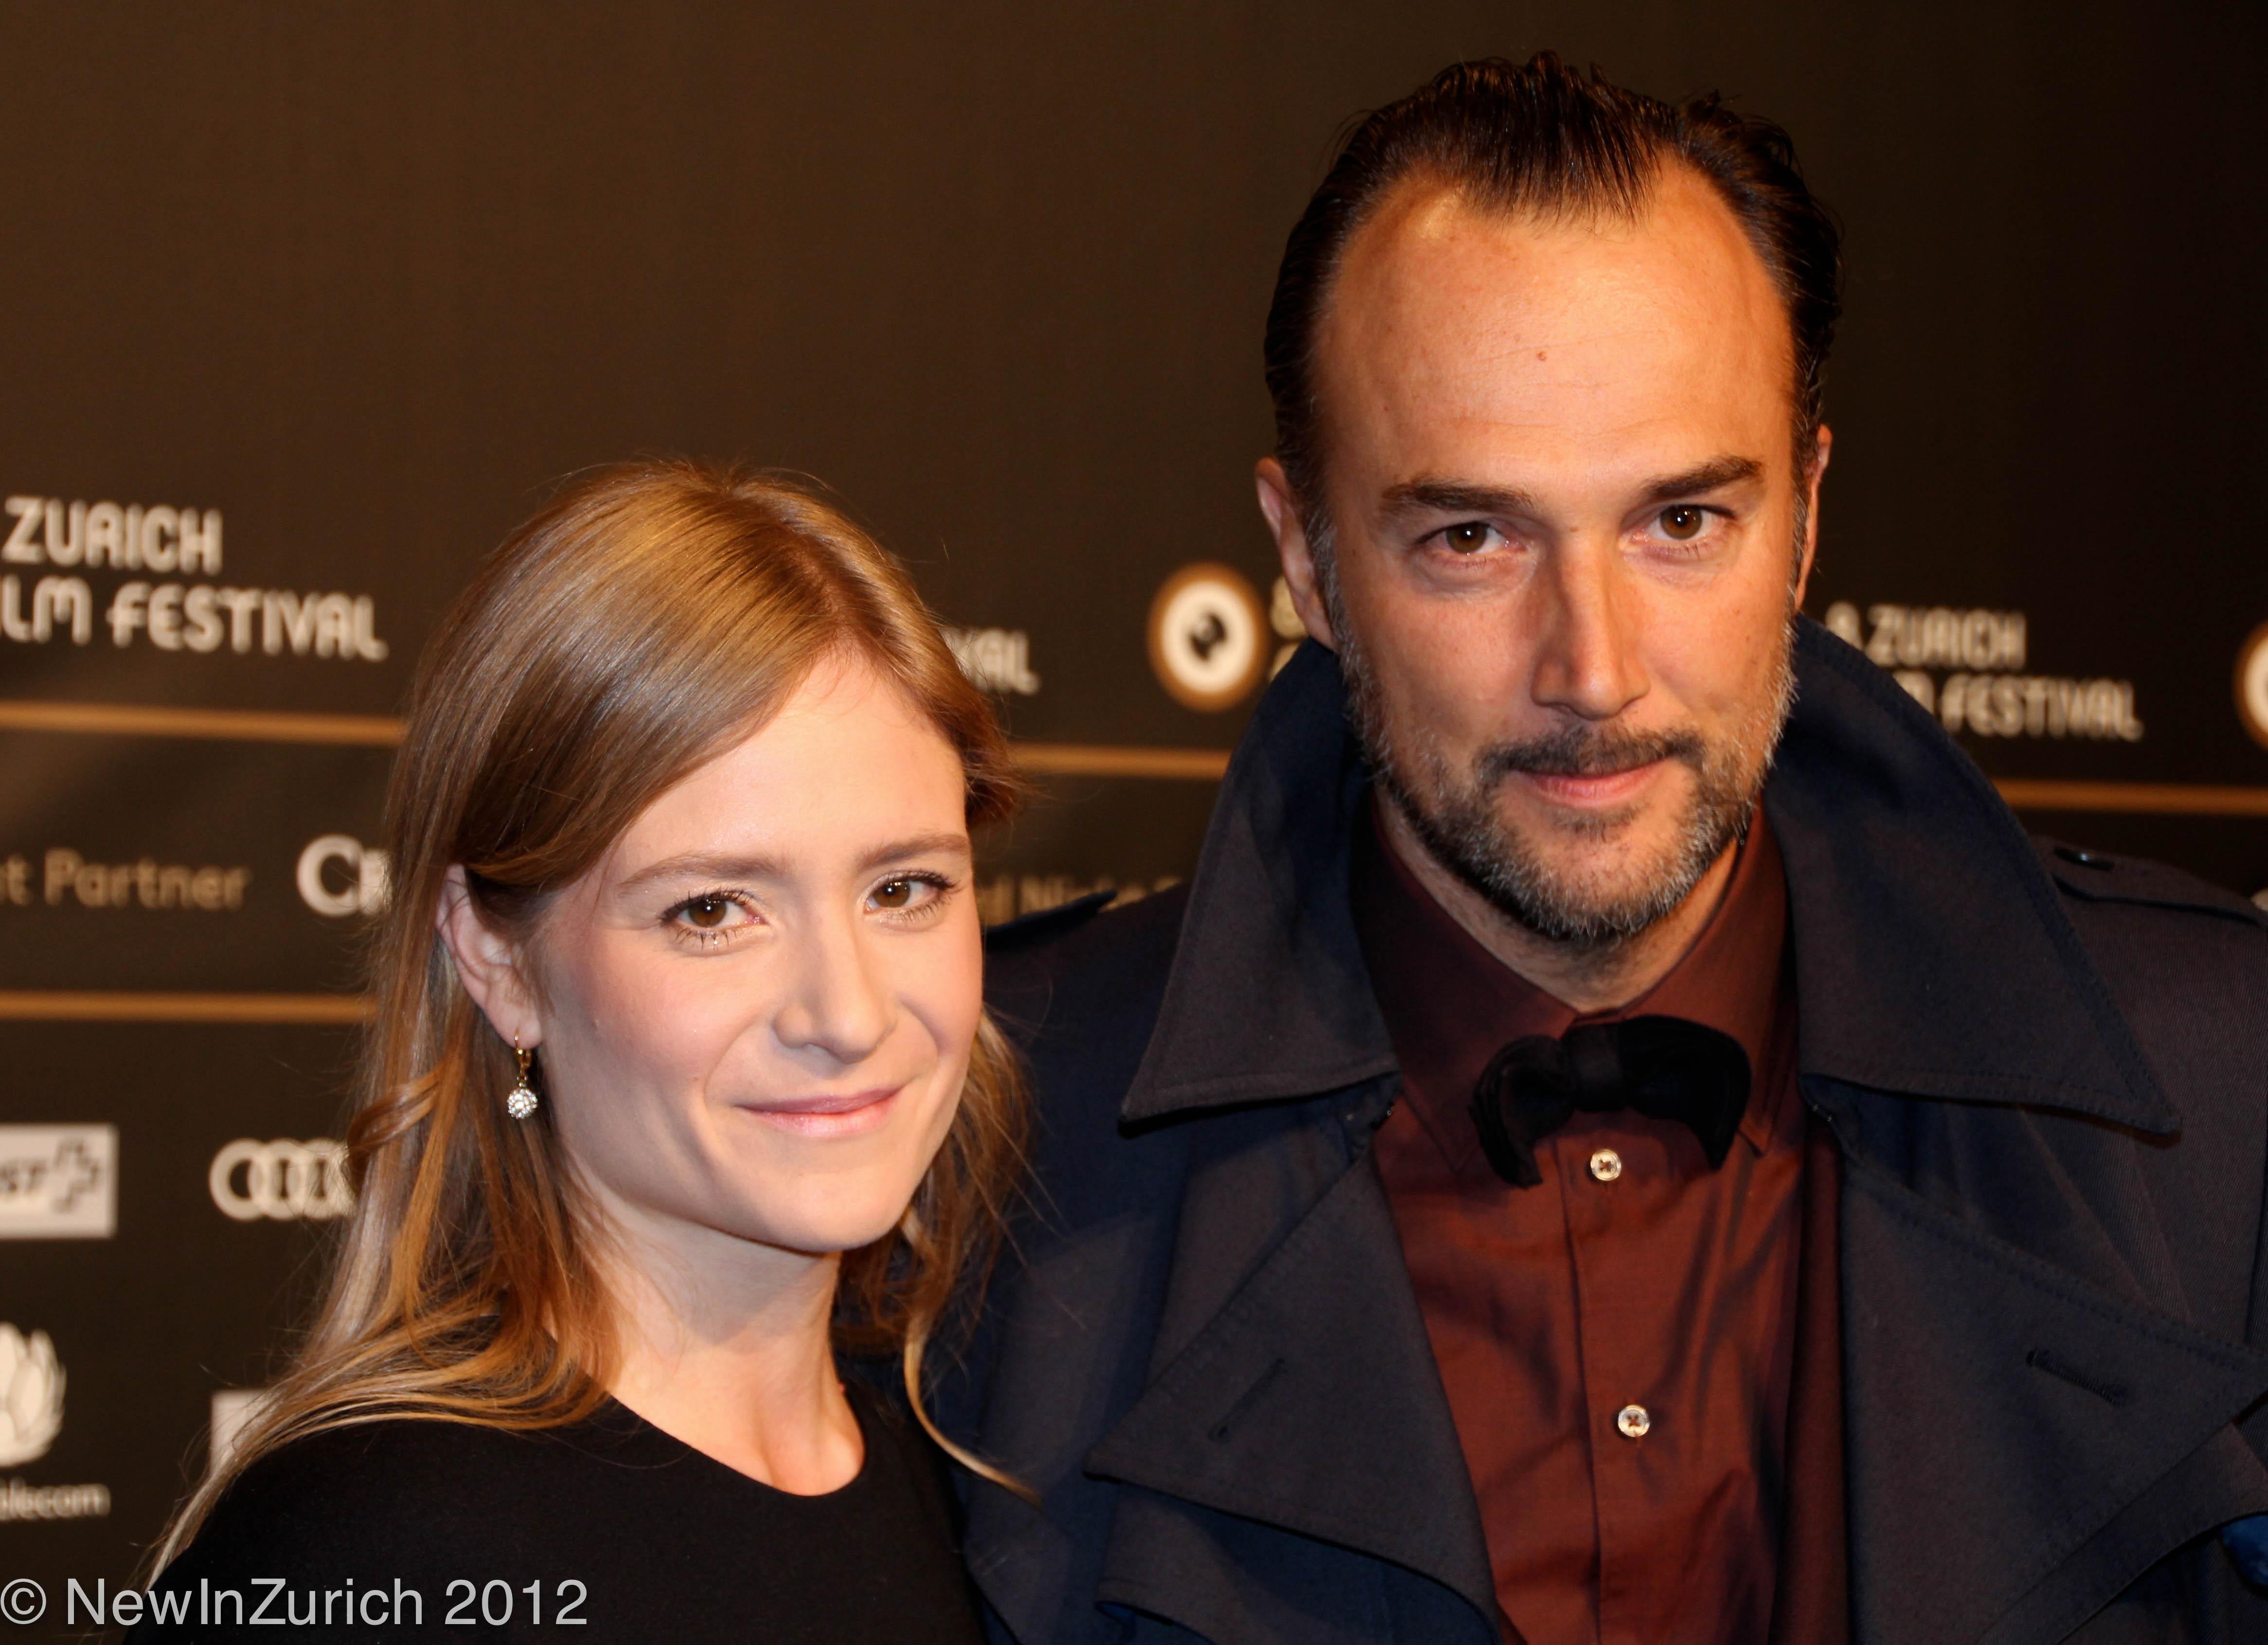 Carlos Leal, Zurich Film Festival 2012 © NewInZurich